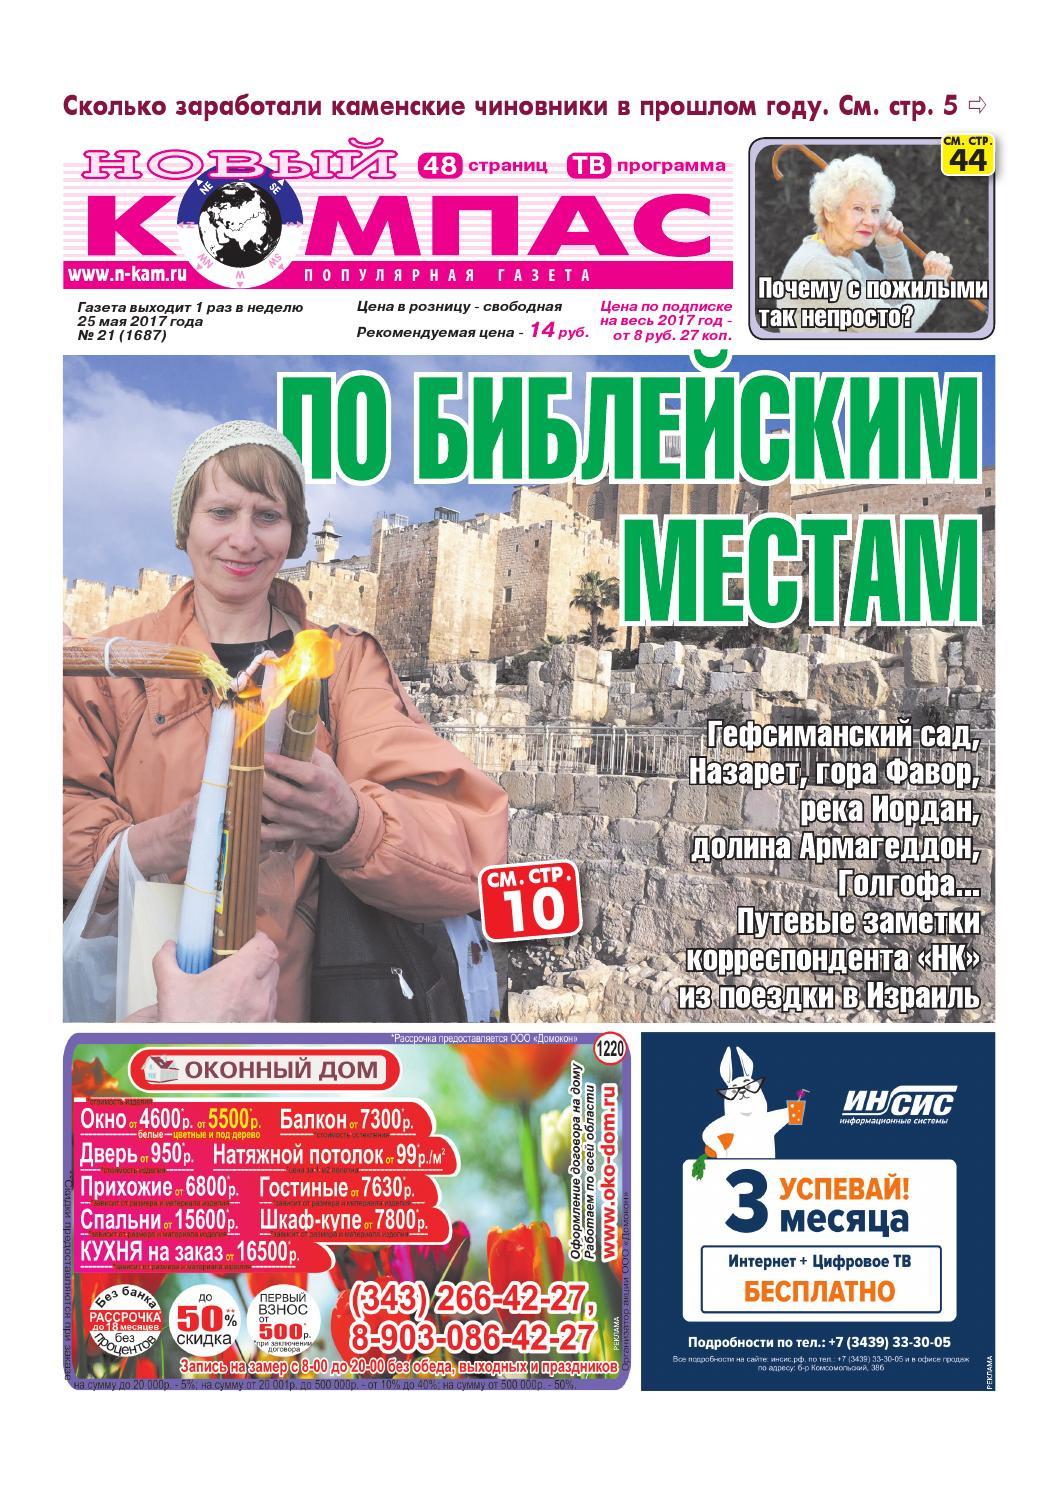 015ed347e52 Новый компас №21 от 25 мая 2017 by Медиа-группа Компас - issuu